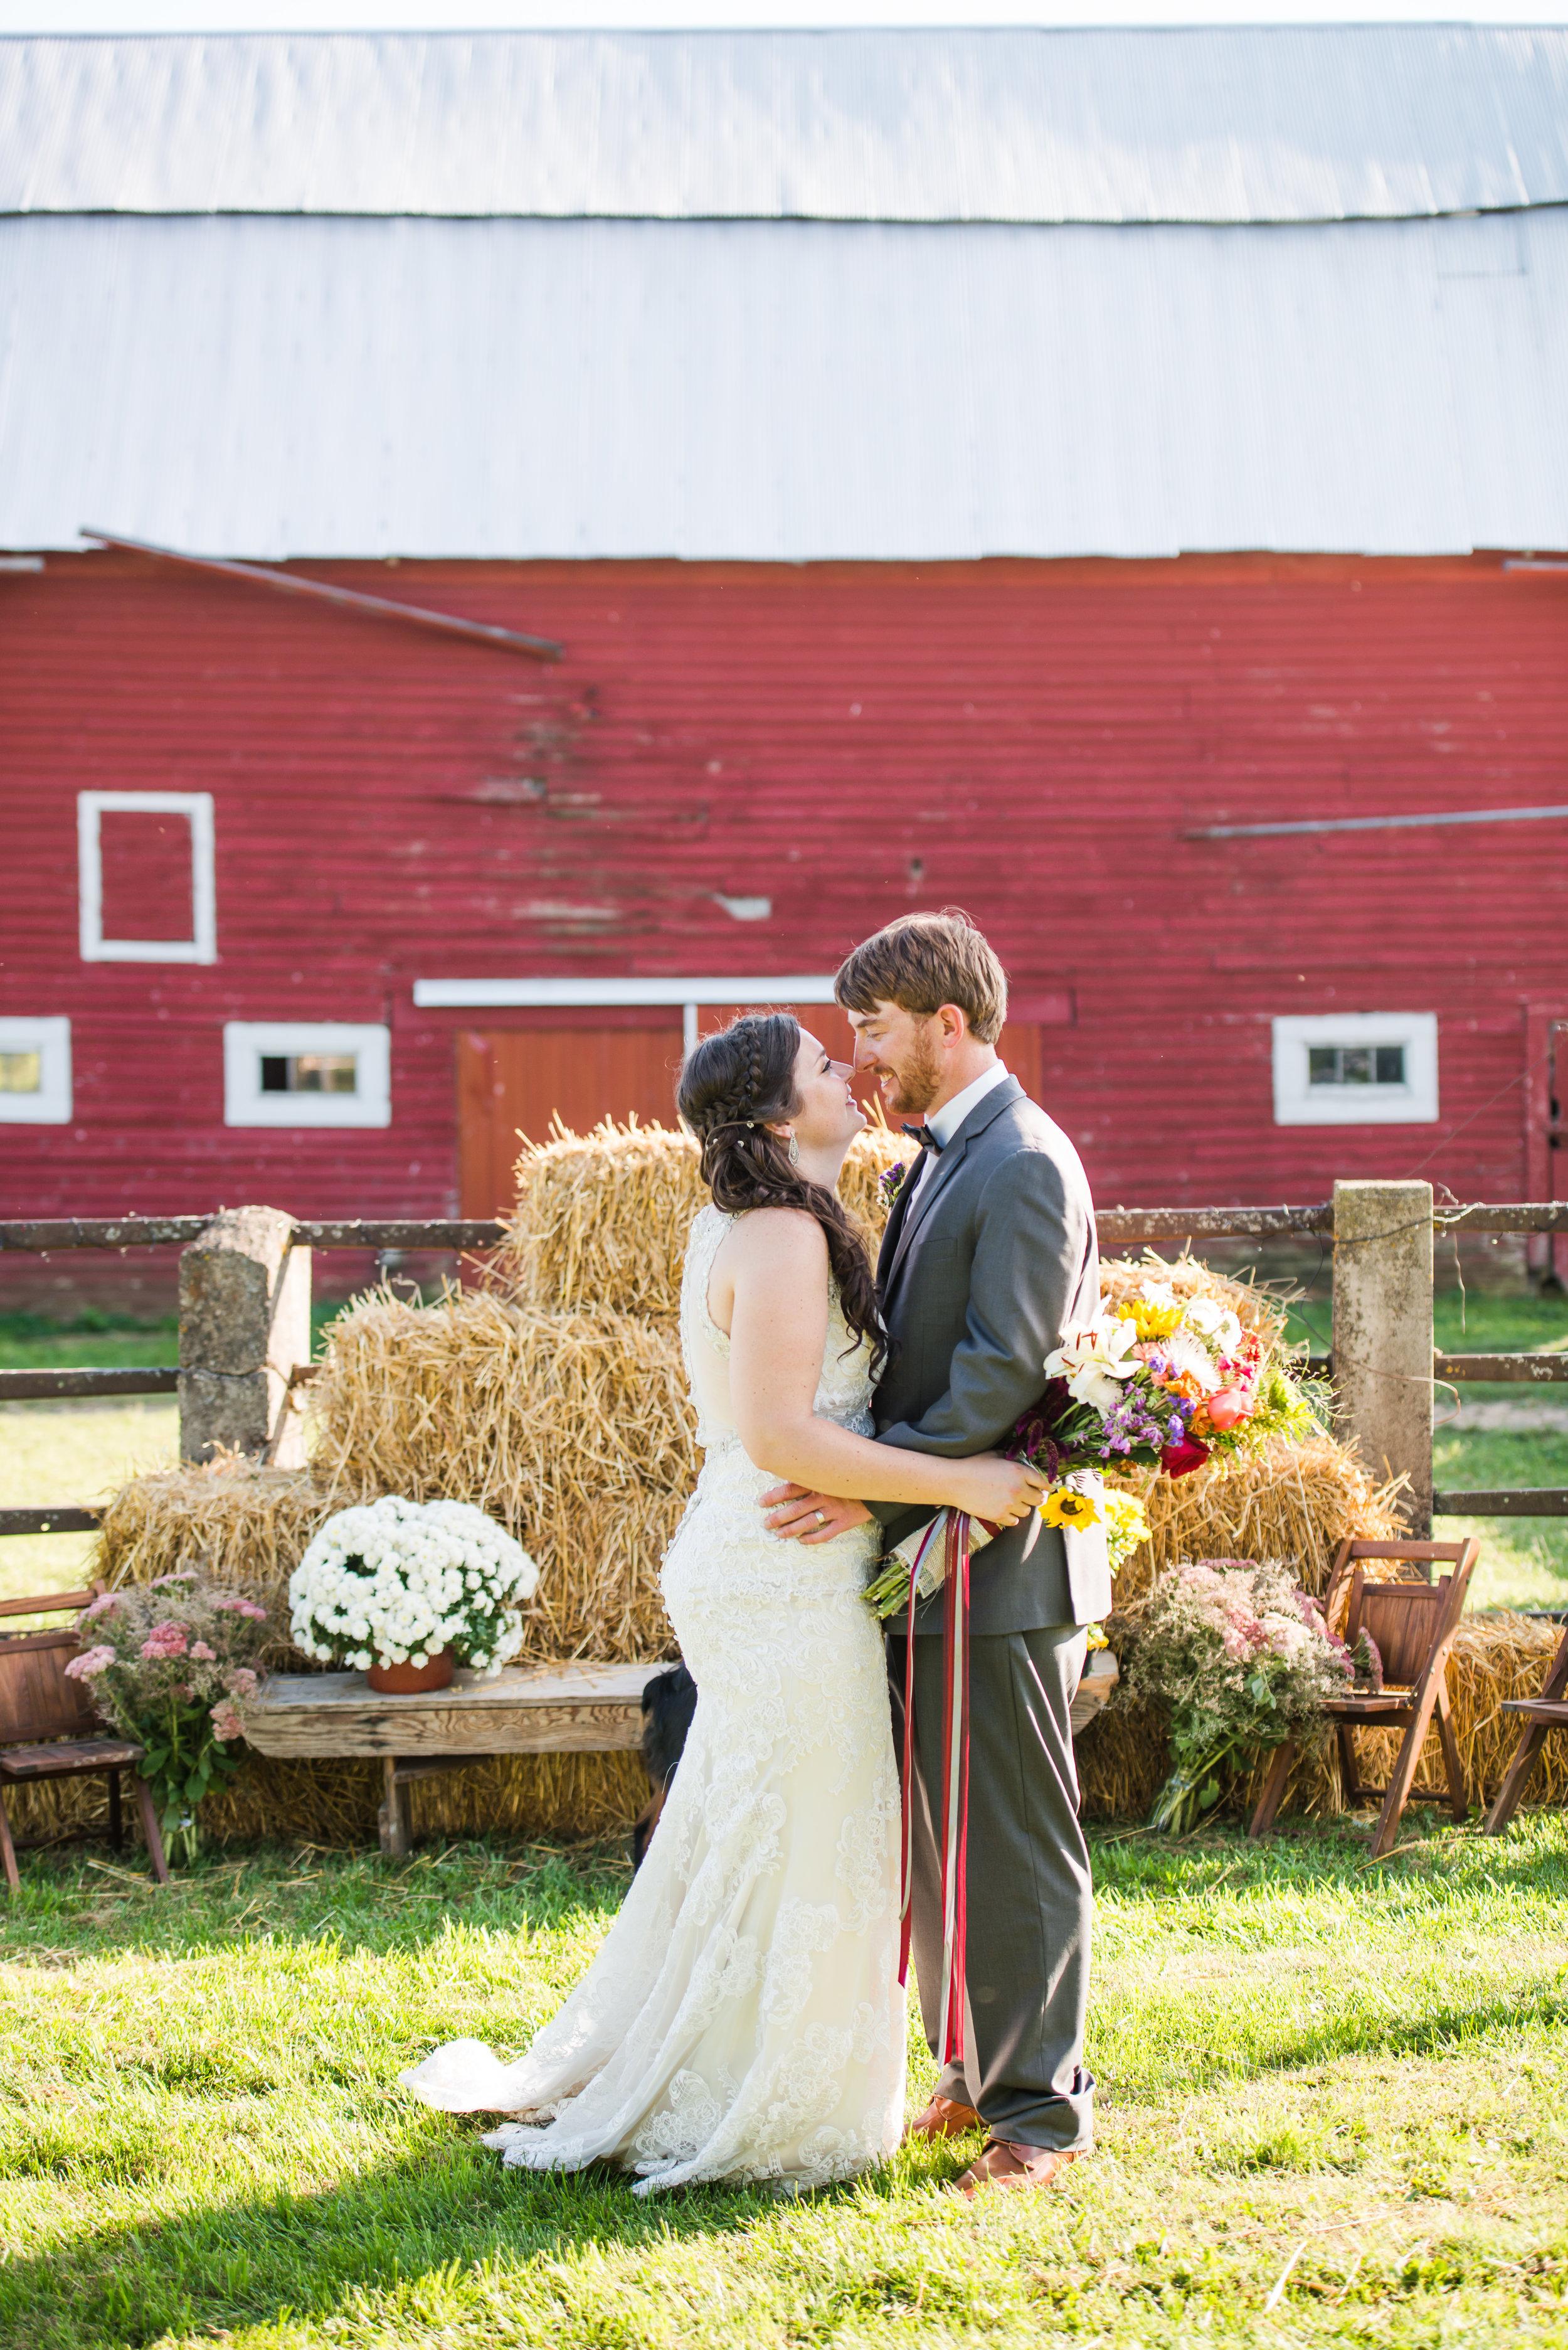 Ruxin John Photography- Barn Weddings Wisconsin